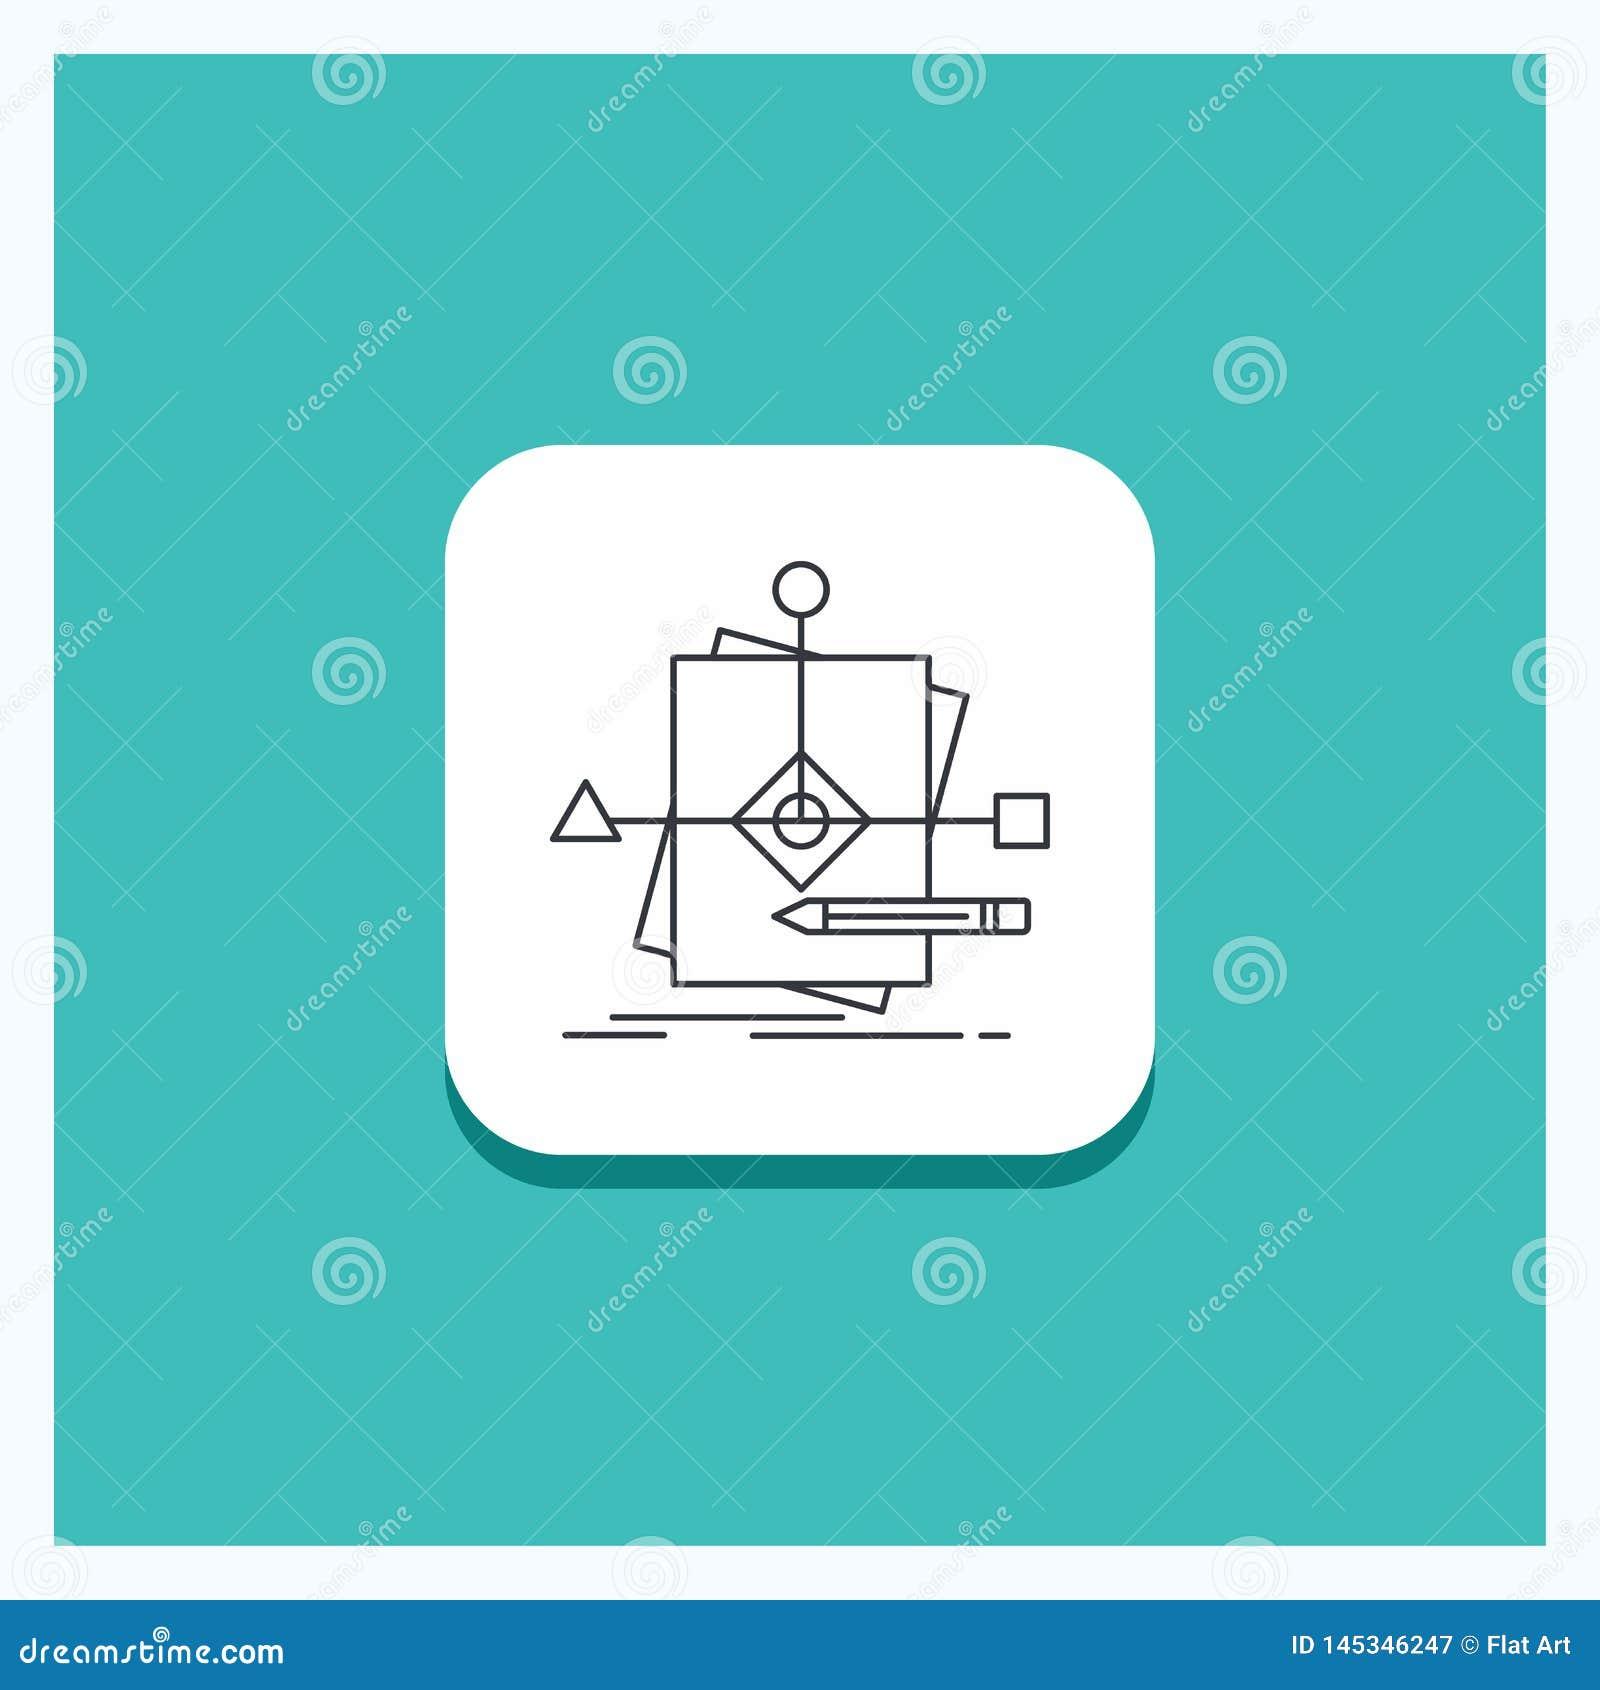 Круглая кнопка для алгоритма, дела, предсказывая, картины, линии предпосылки плана бирюзы значка